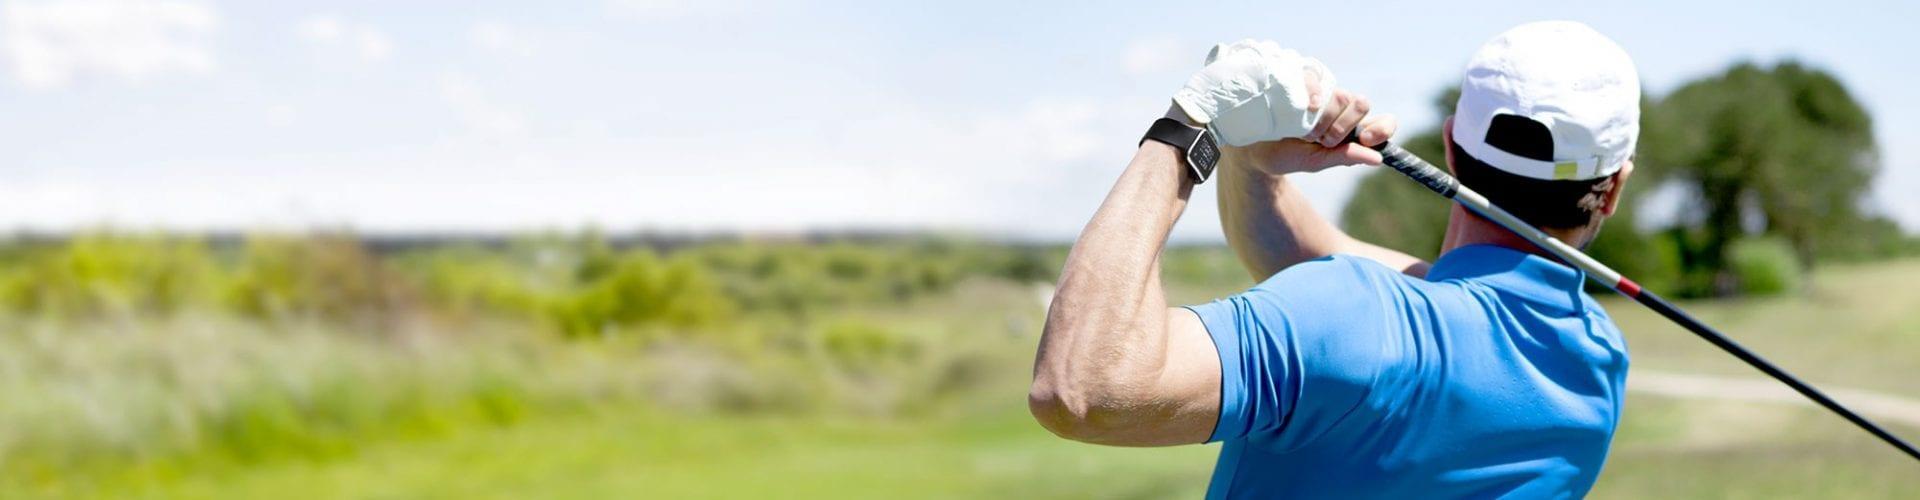 PGA Championship Ticket Demand Breaks Record as 2019 Registration Begins